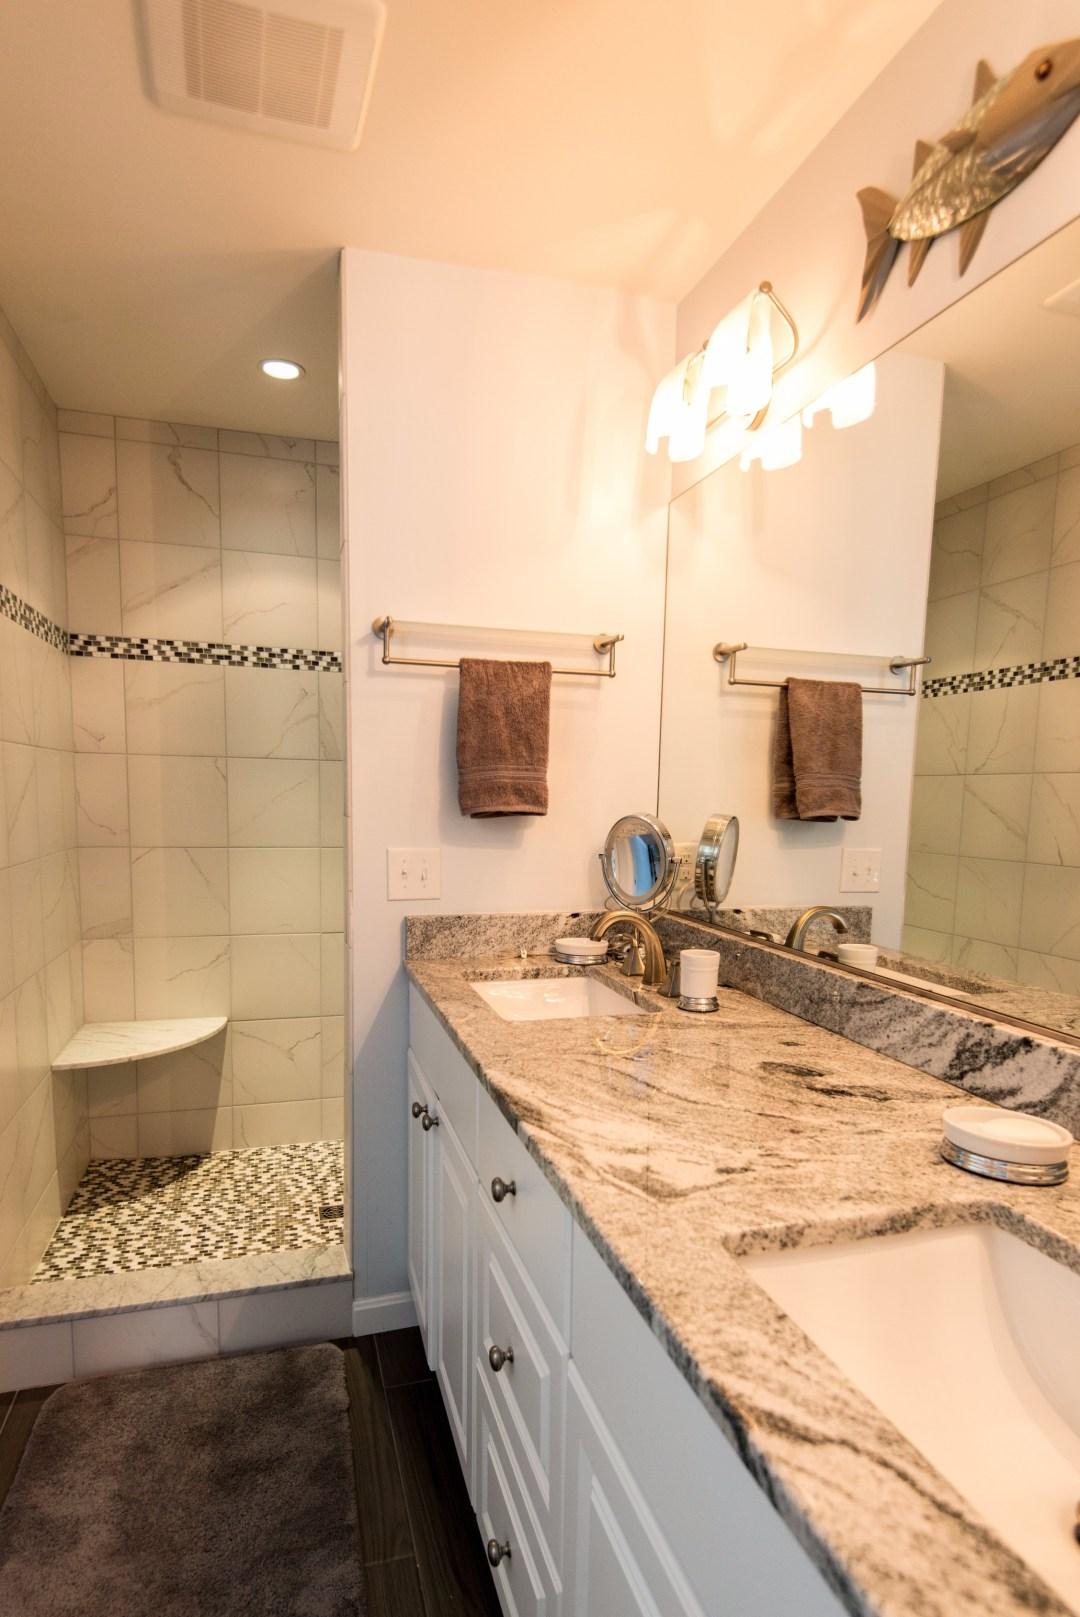 Bathroom Remodel in Willow Oak, Ocean View DE with Dark Wood Floor, Double Bowl, White Vanity Cabinet and Full Length Mirror